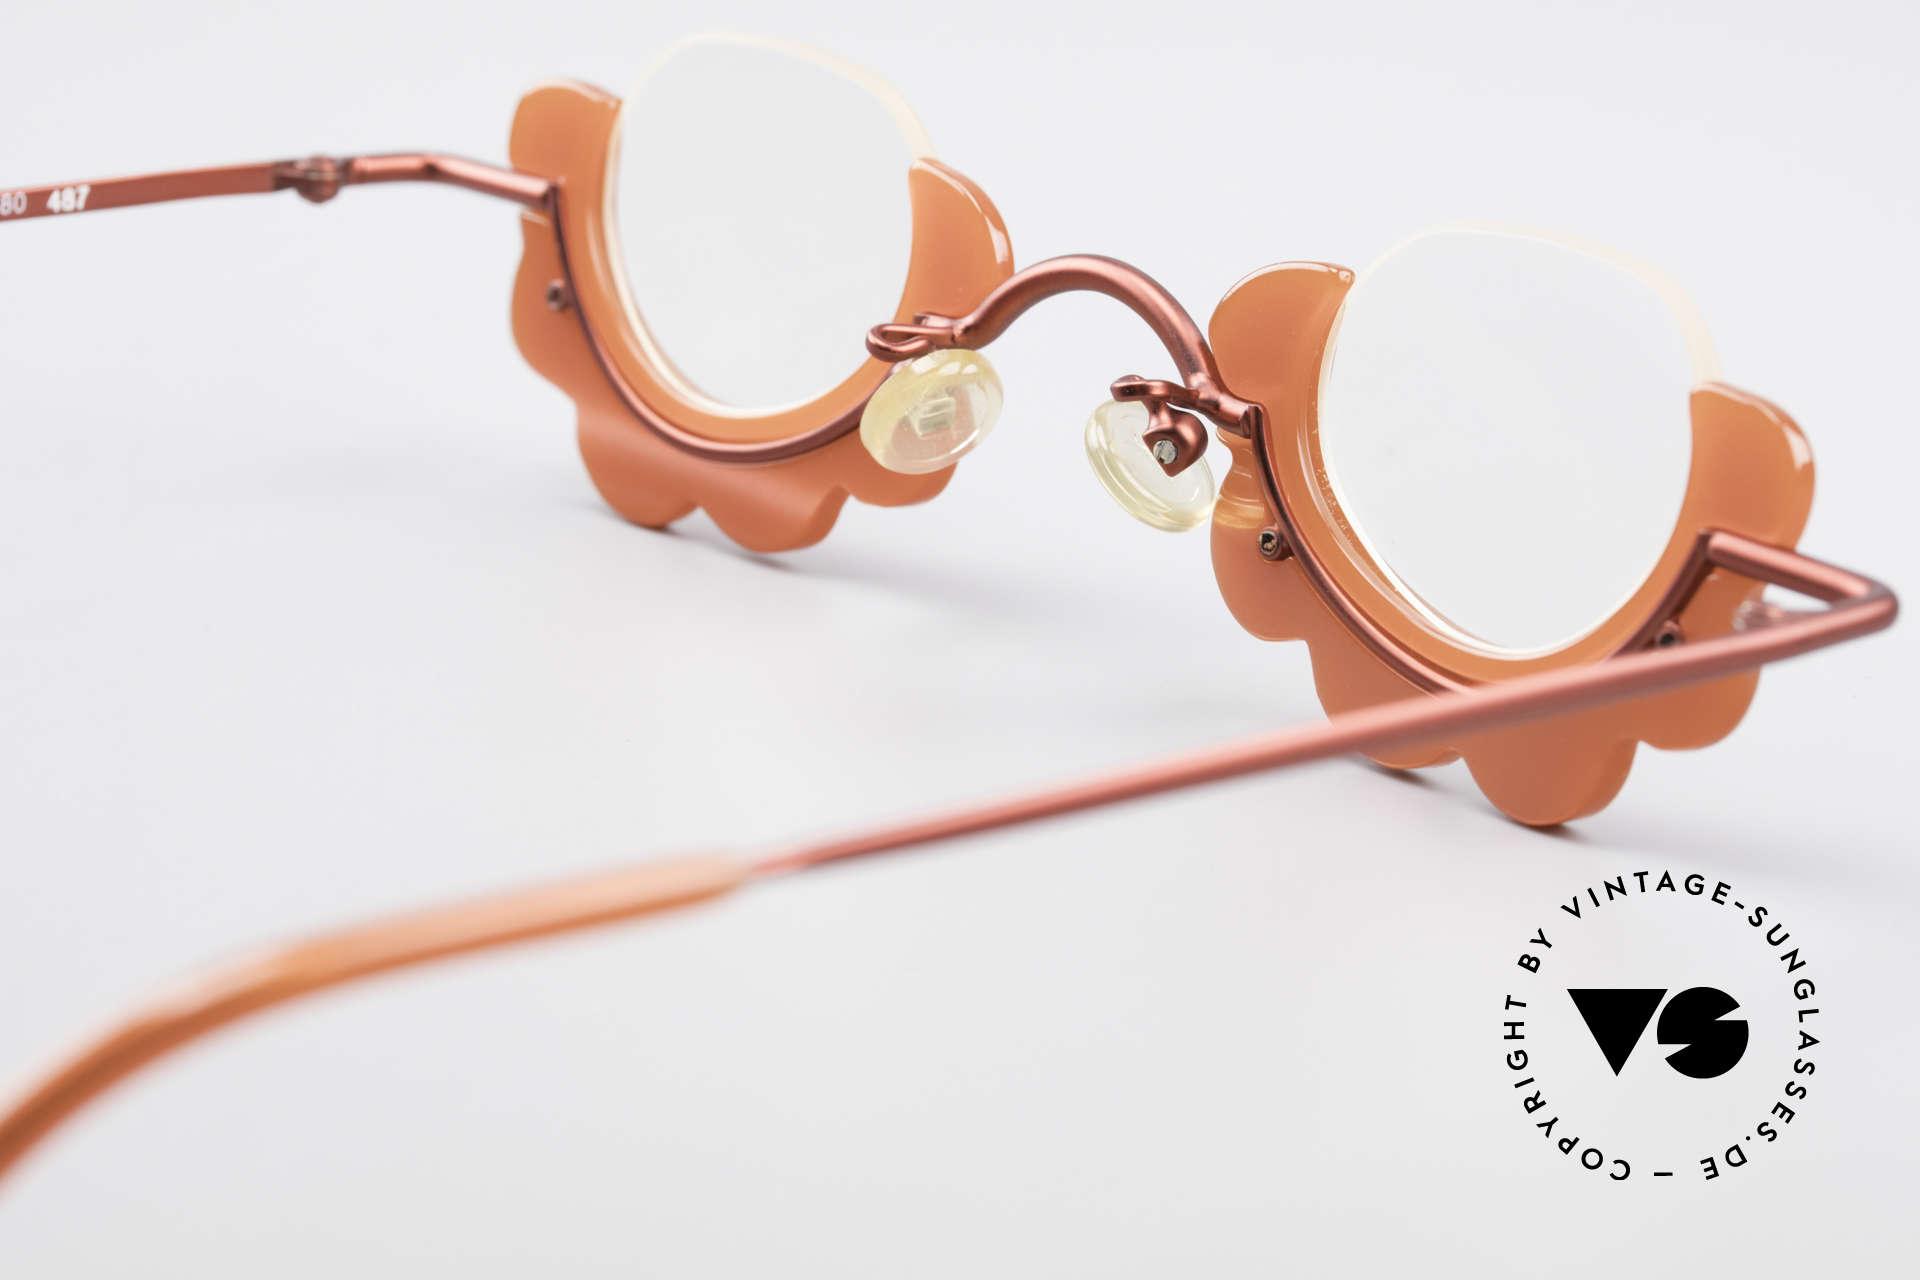 L.A. Eyeworks BUMBLE 487 Enchanting Ladies Eyeglasses, NO RETRO eyewear, but a beautiful old original (rarity), Made for Women